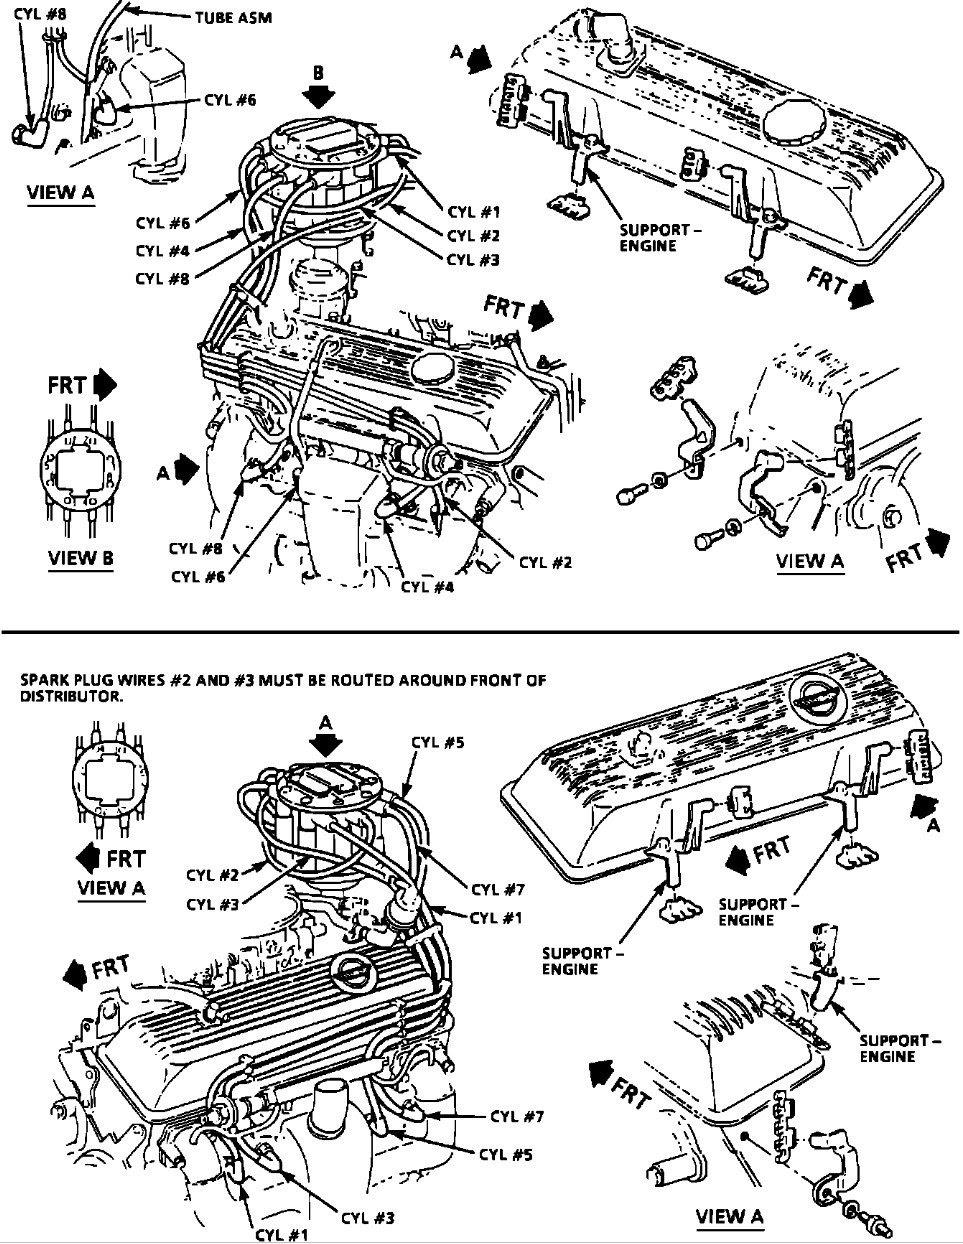 32 Spark Plug Wire Diagram - Wiring Diagram List